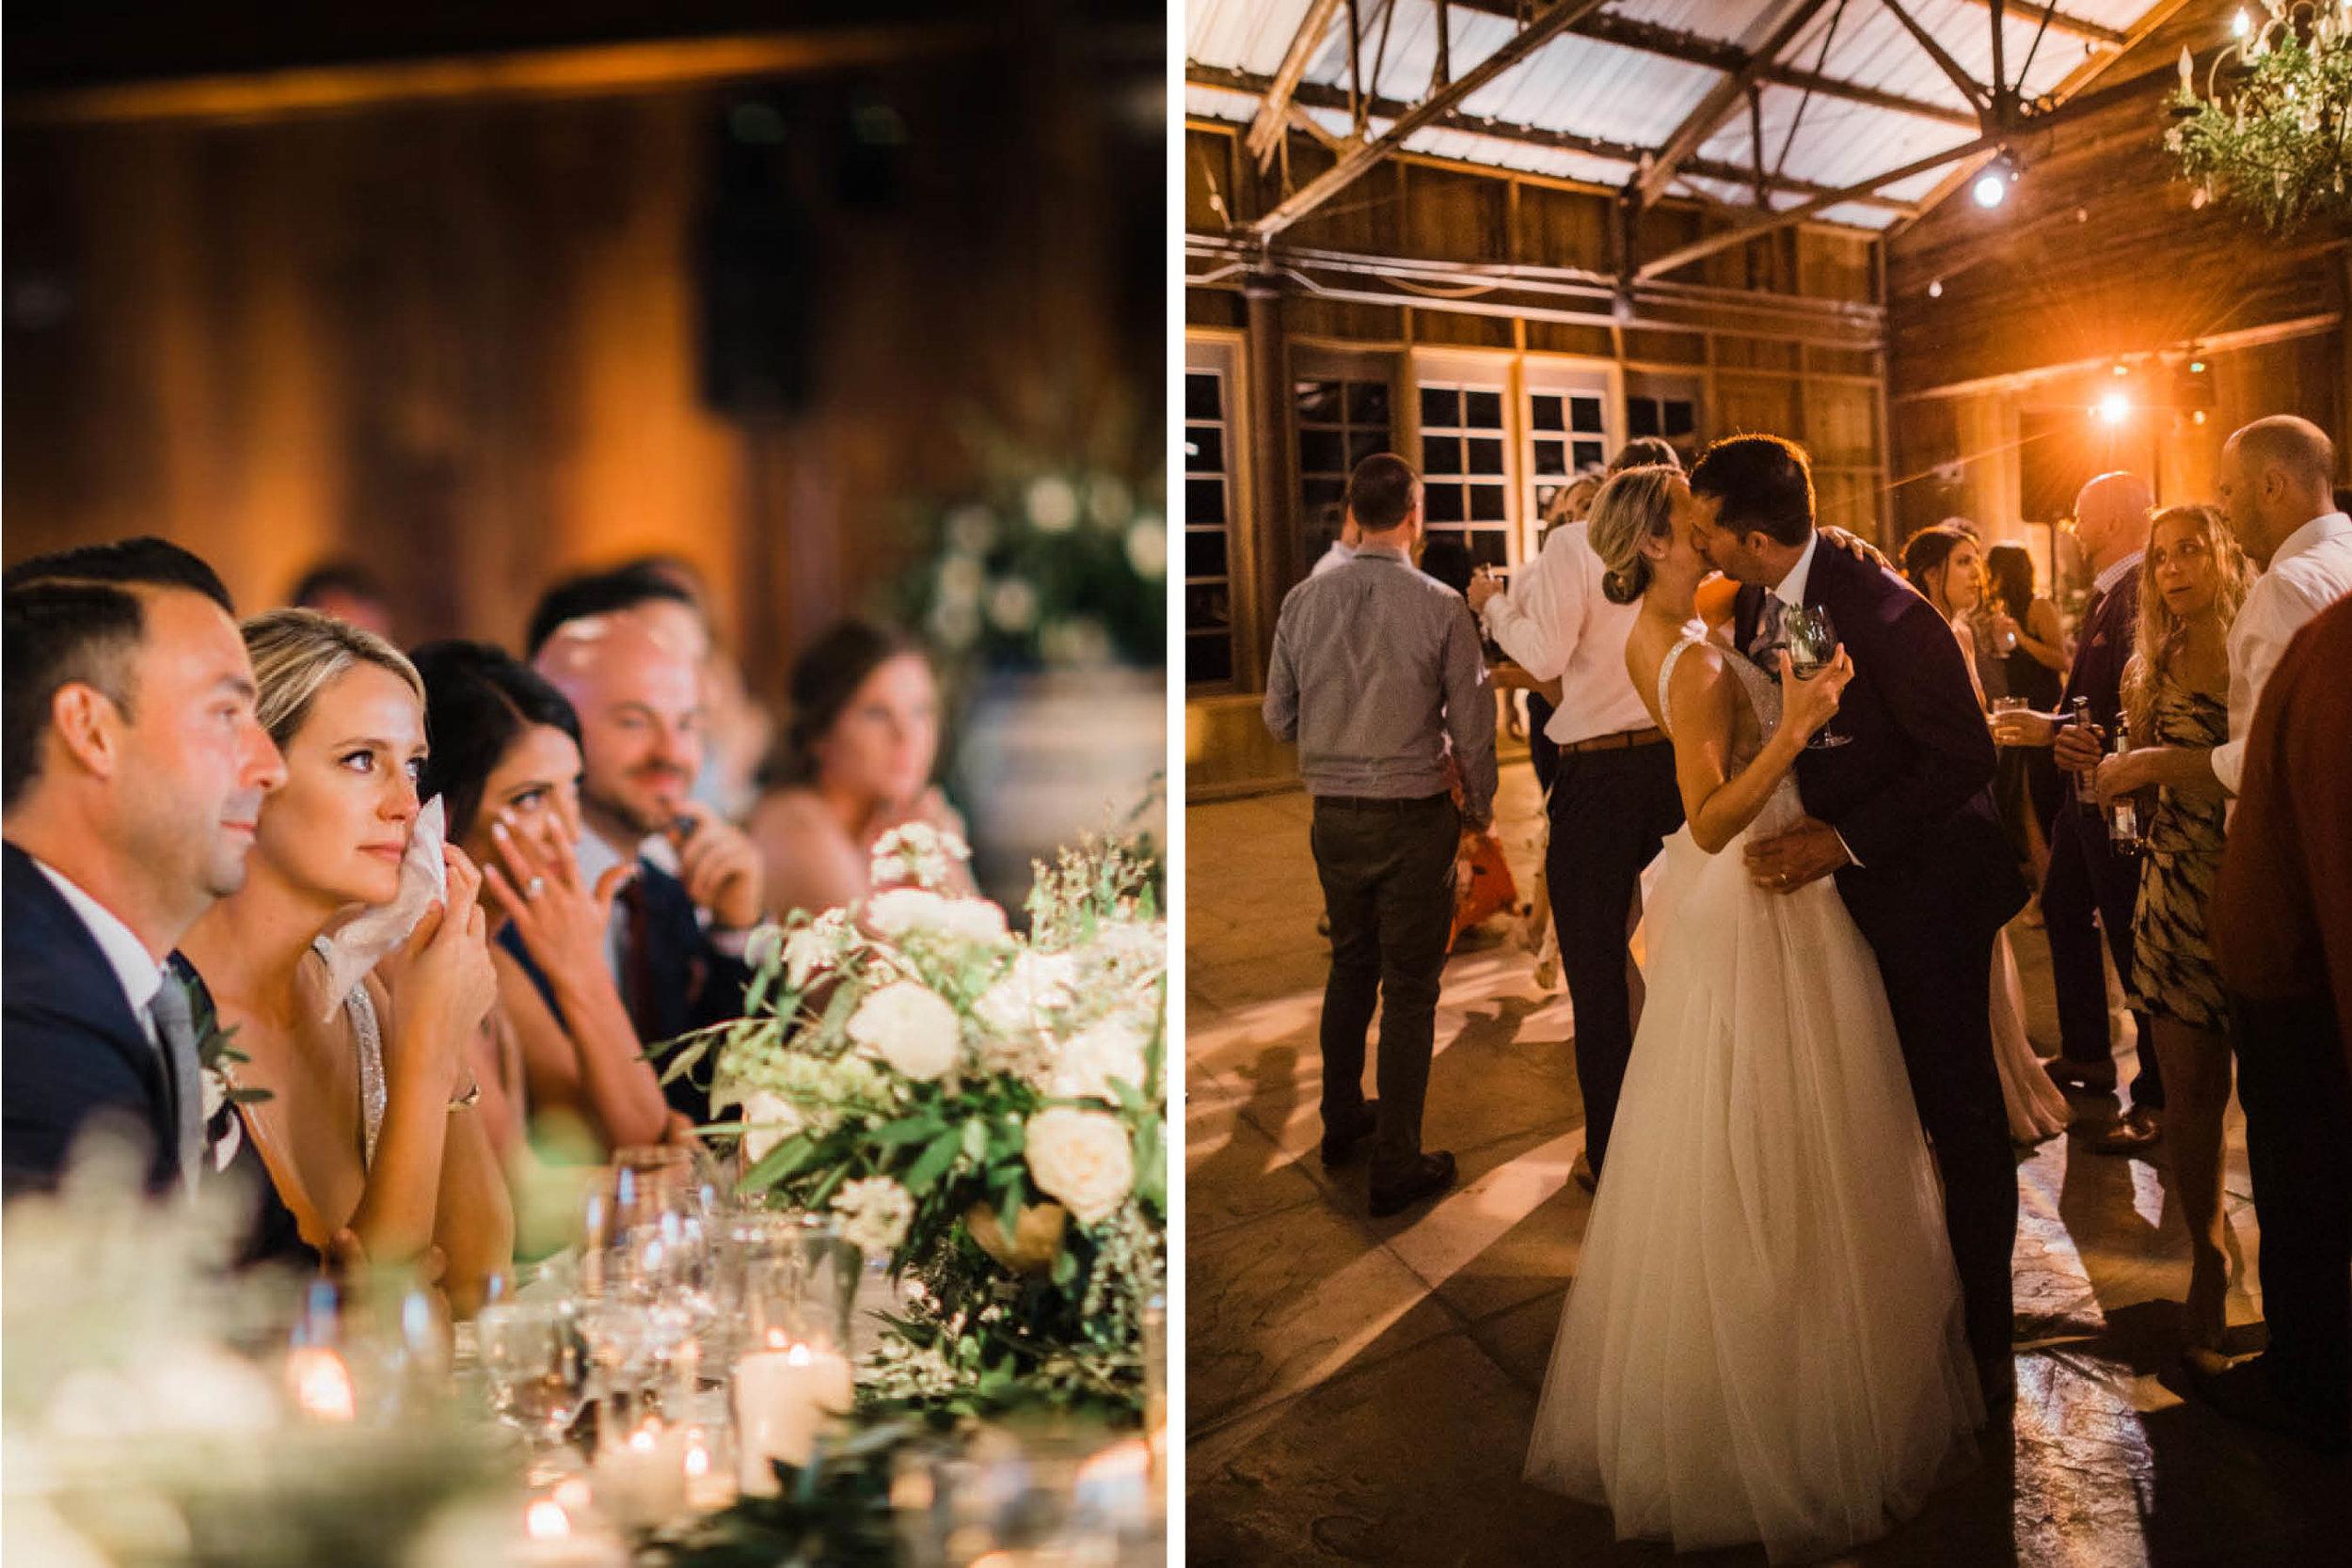 alegria-by-design-wedding-planner-planning-event-design-coordinator-day-of-month-crossroads-estate-garden-vineyard-firestone-barn-location-rustic-santa-barbara (1 (21).jpg